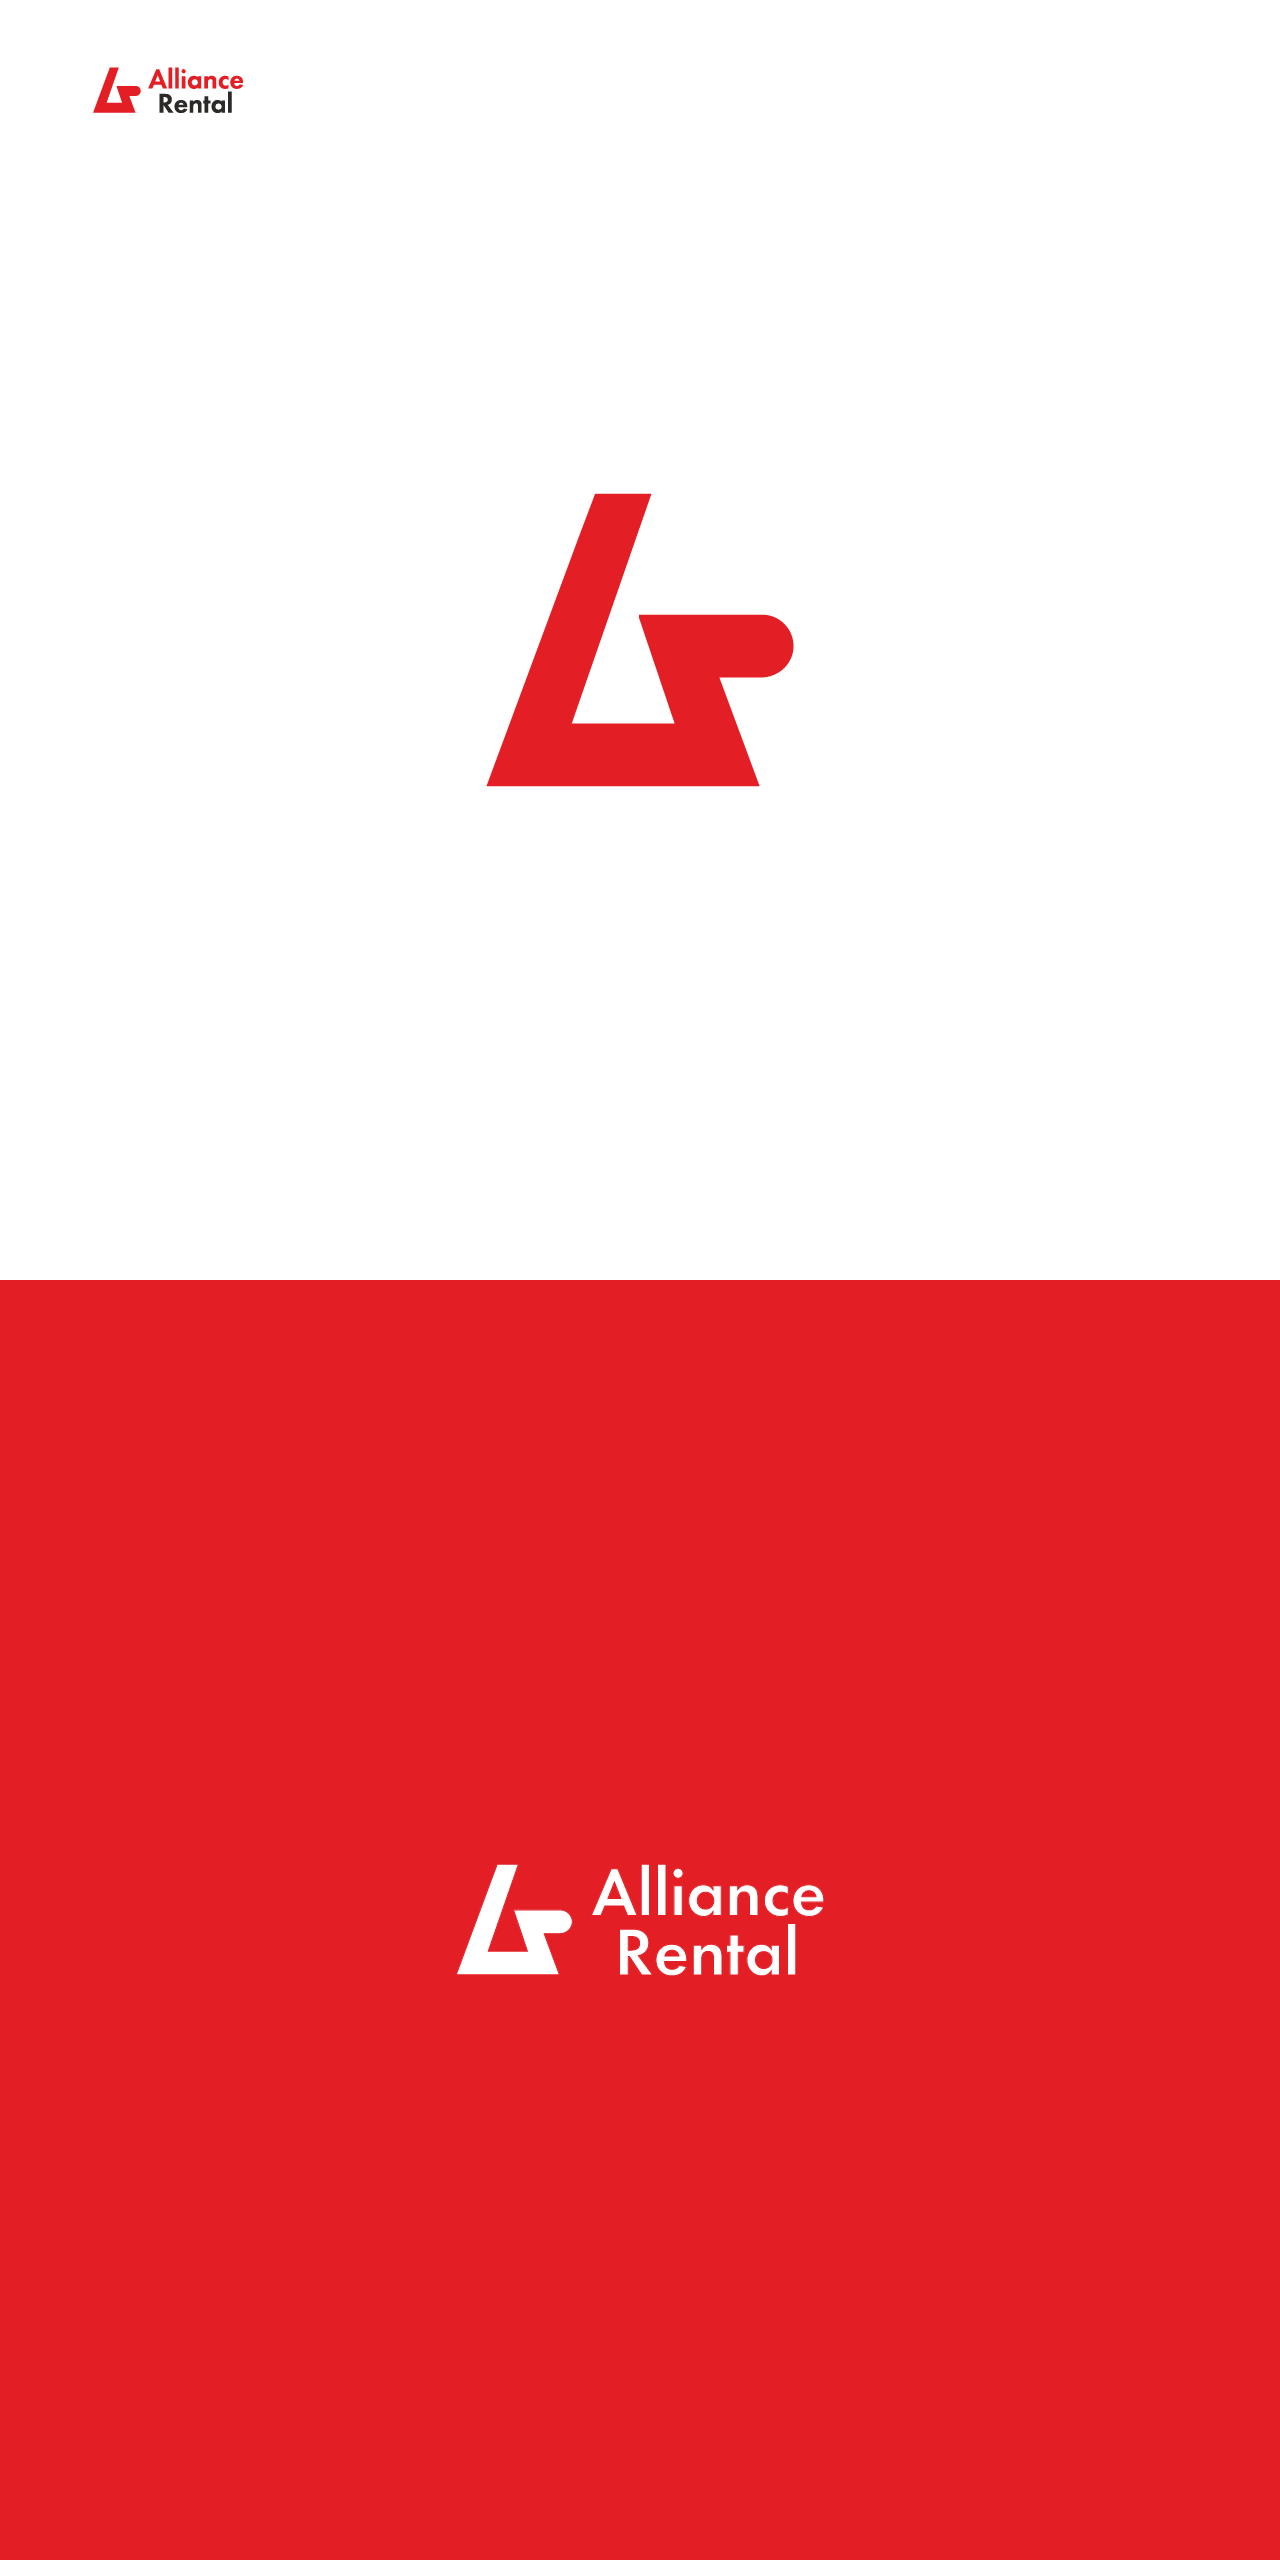 Alliance Rental